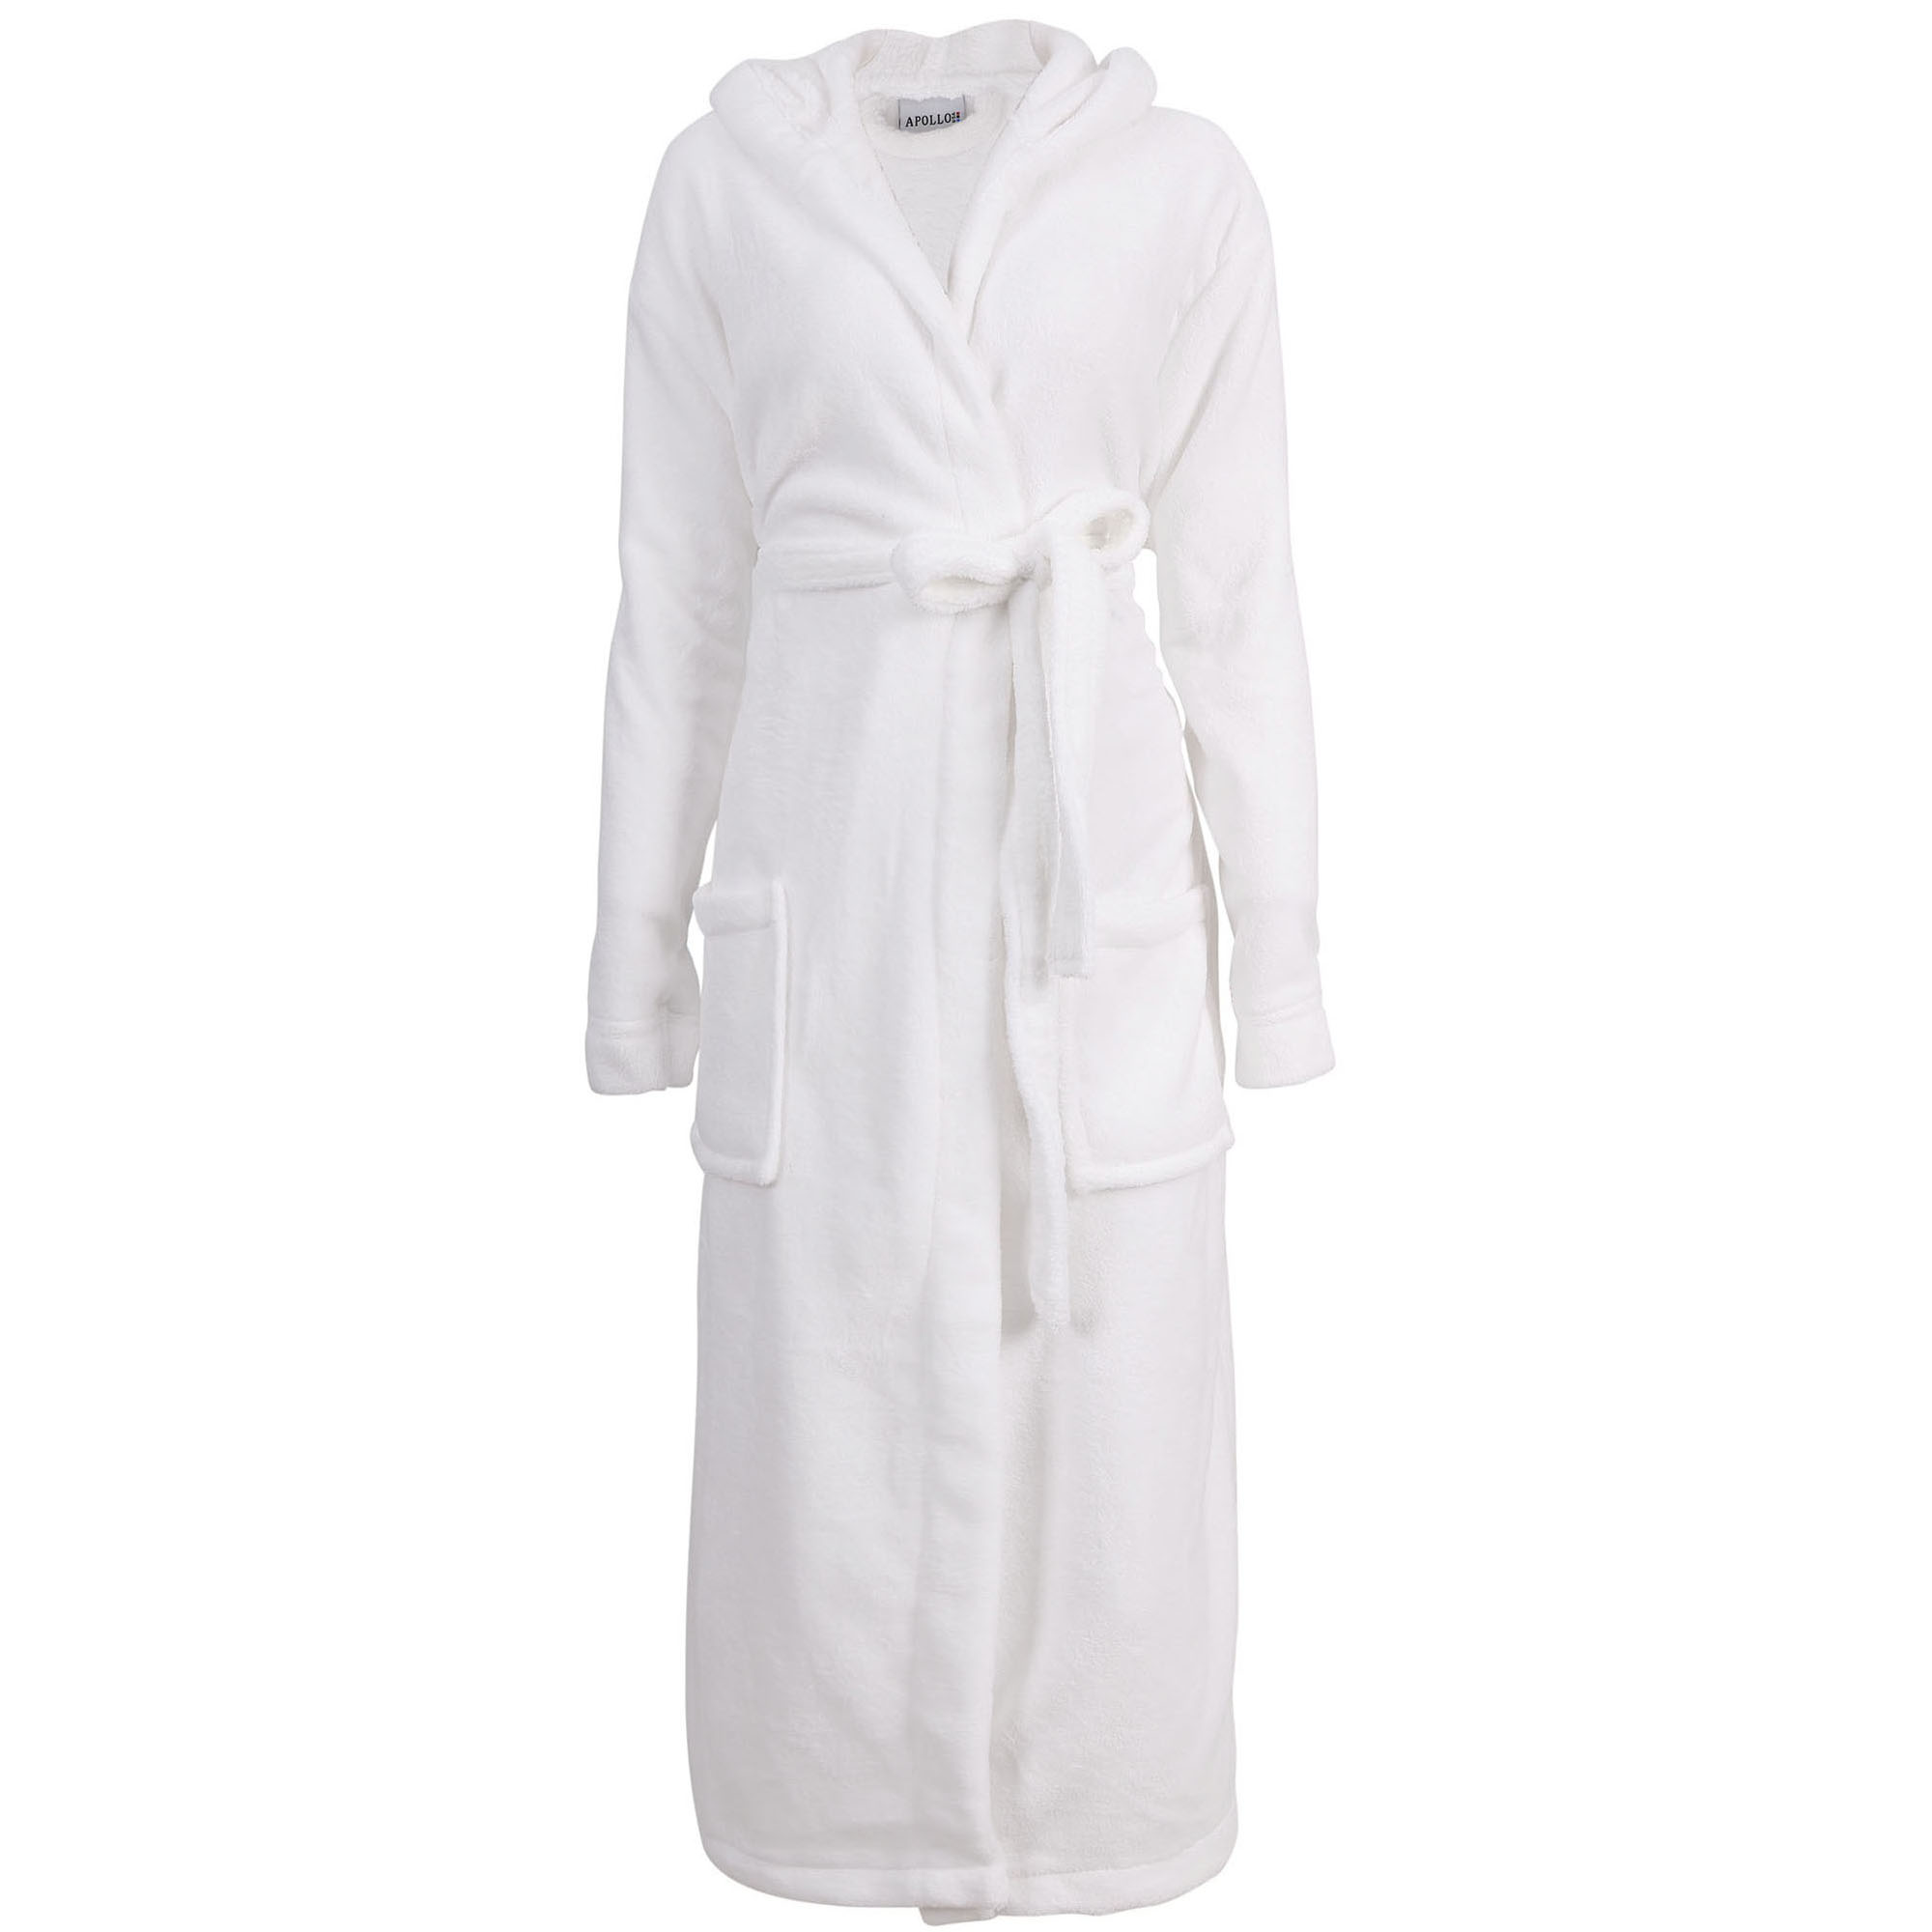 Bathrobes for Women Hooded Robe Plush Soft Warm Fleece Bathrobe